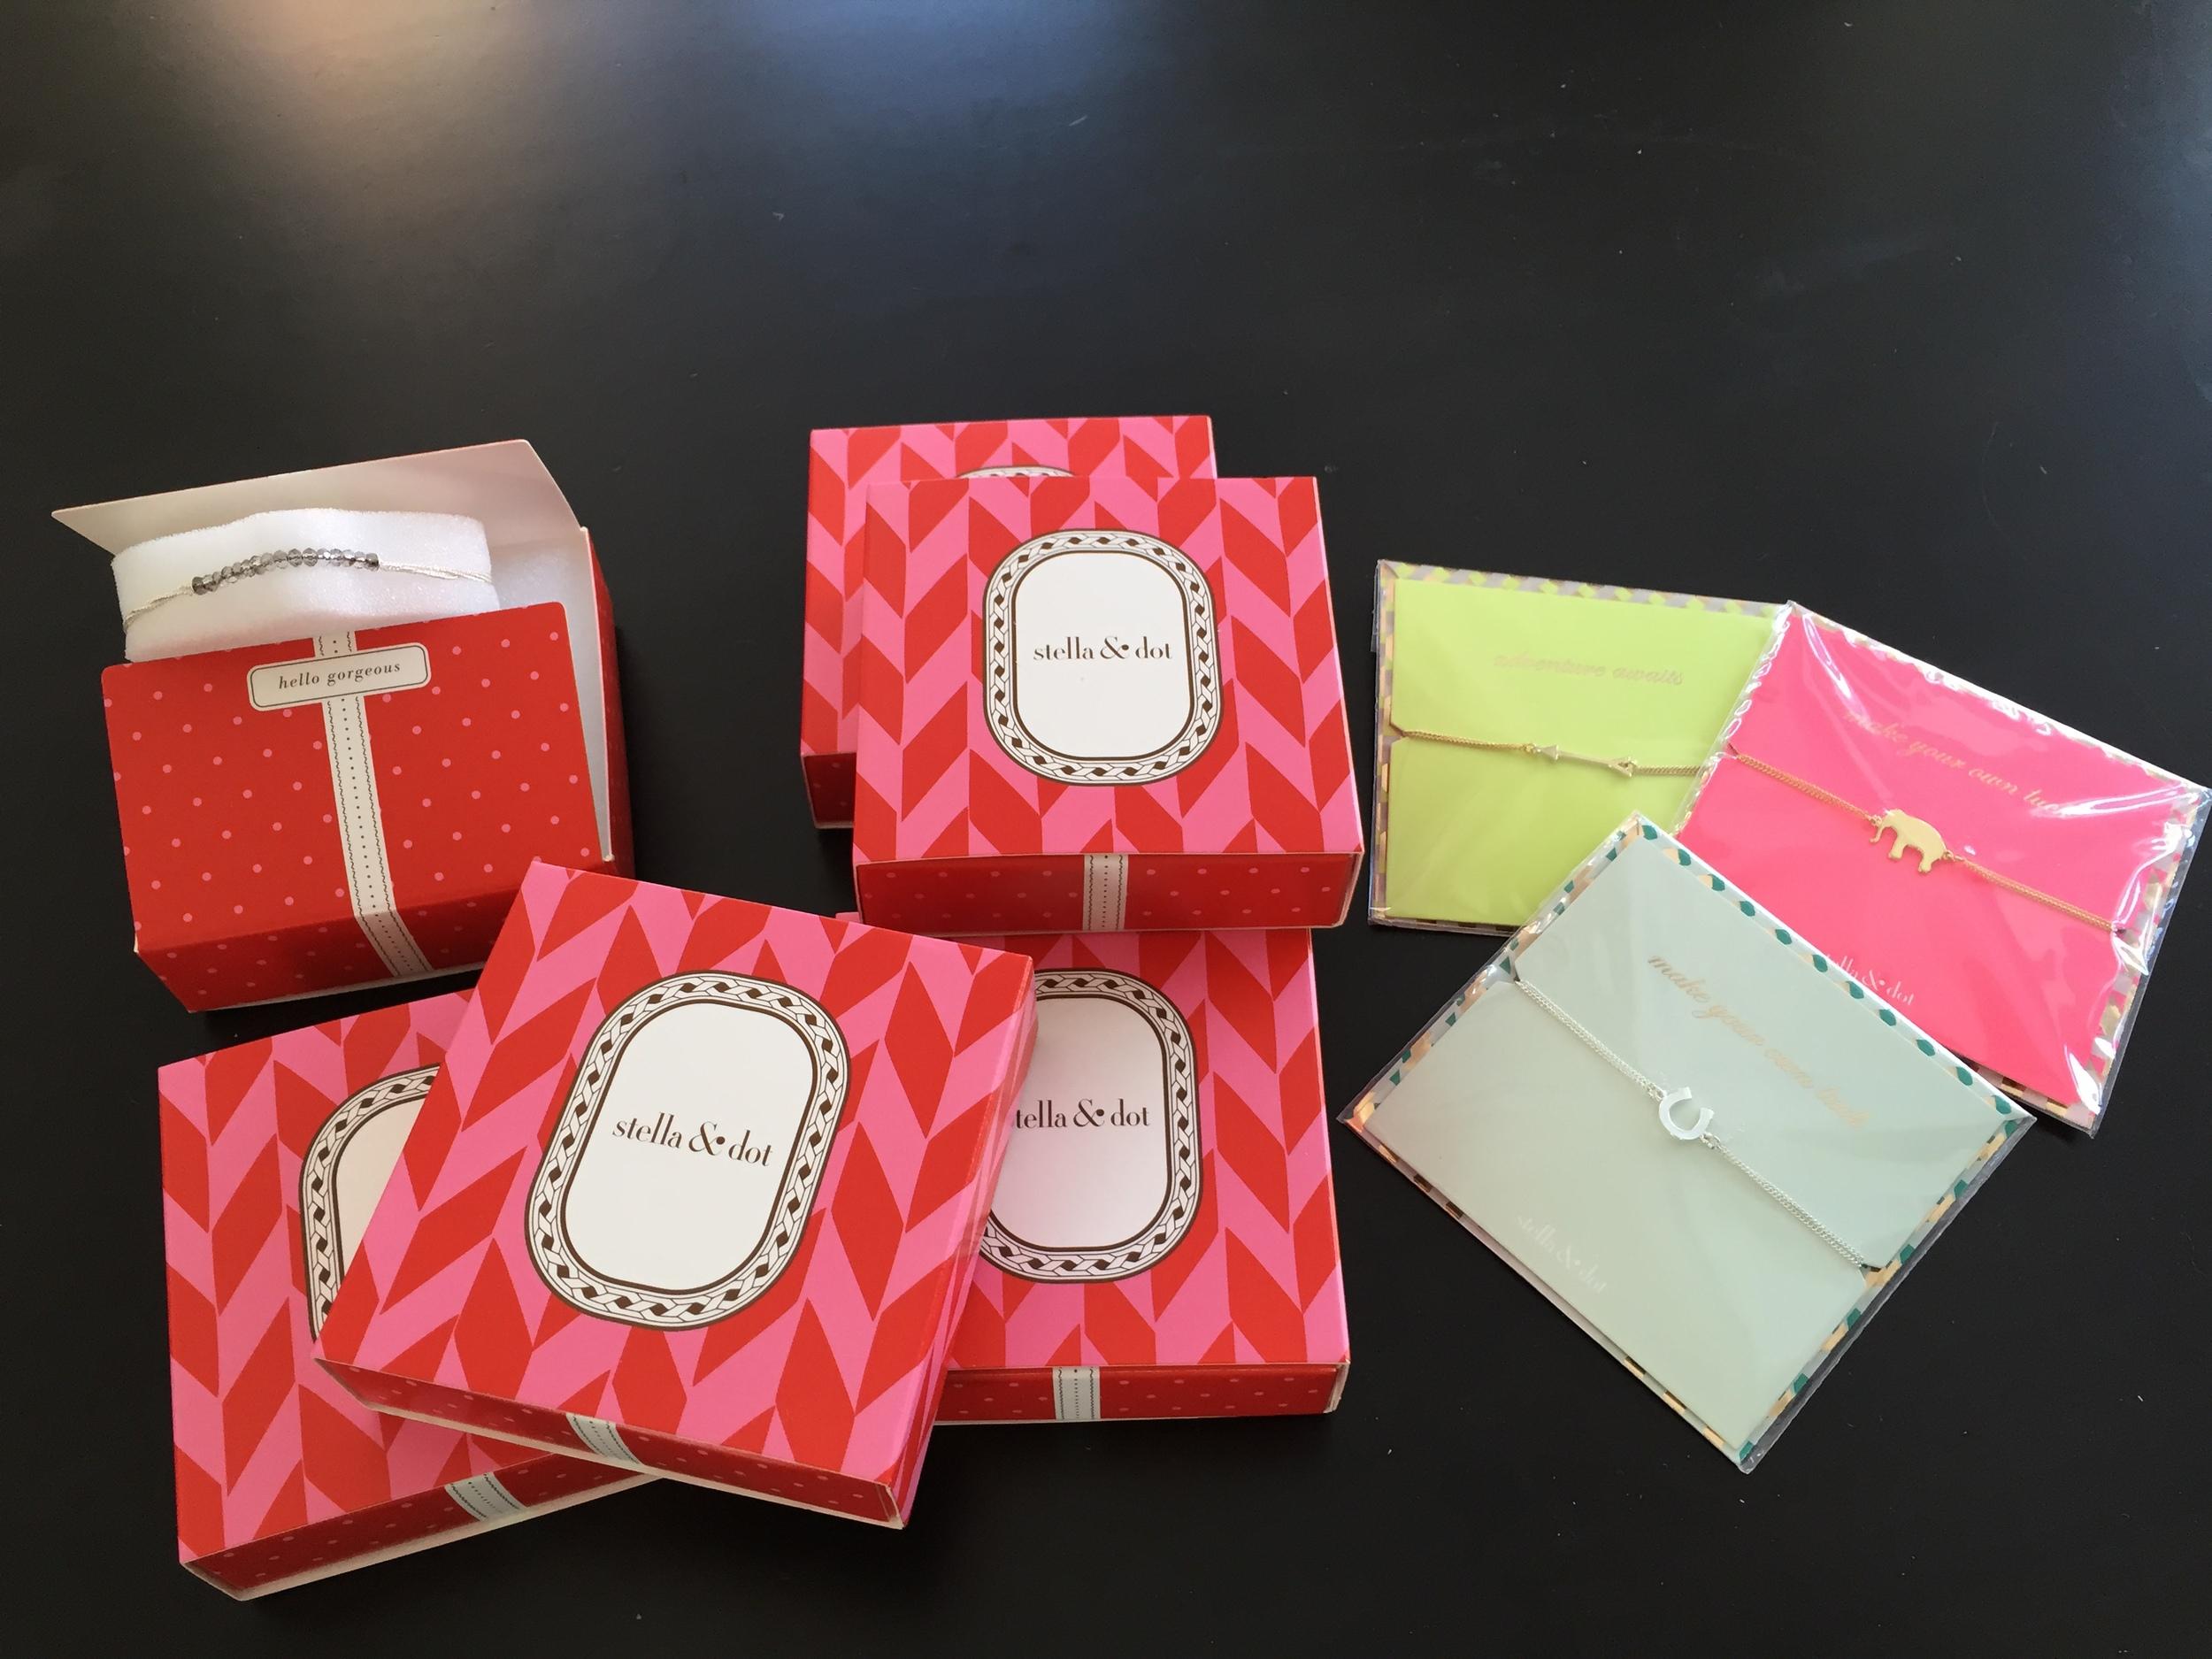 Four Light Bracelets, Radiance Coil, Color block Cluff-Citron, Wishing Bracelets - Elephant, Horseshoe and Arrow.